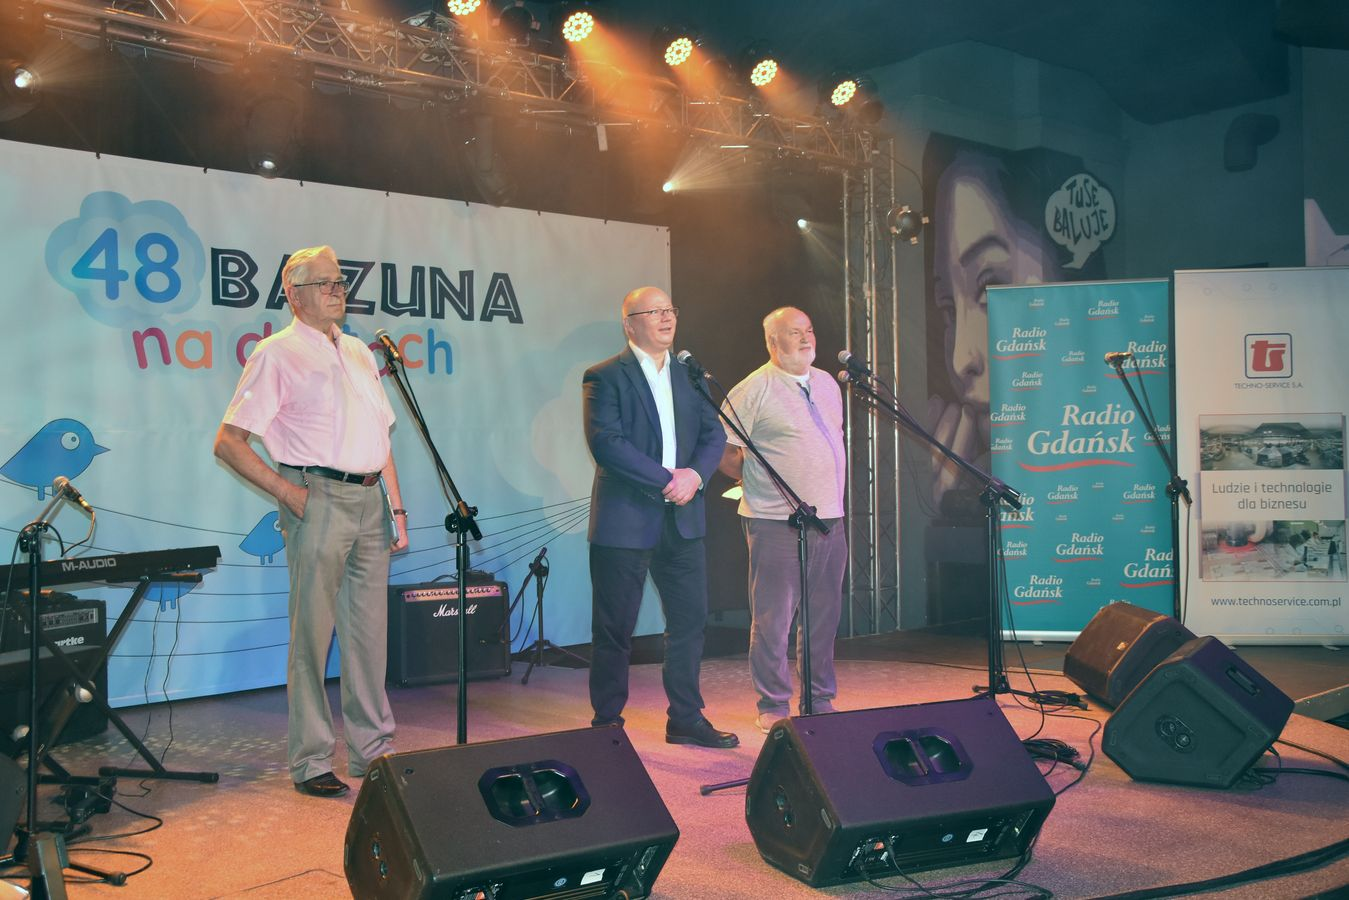 BAZUNA 2020 fot_Janusz Wikowski A31_0198